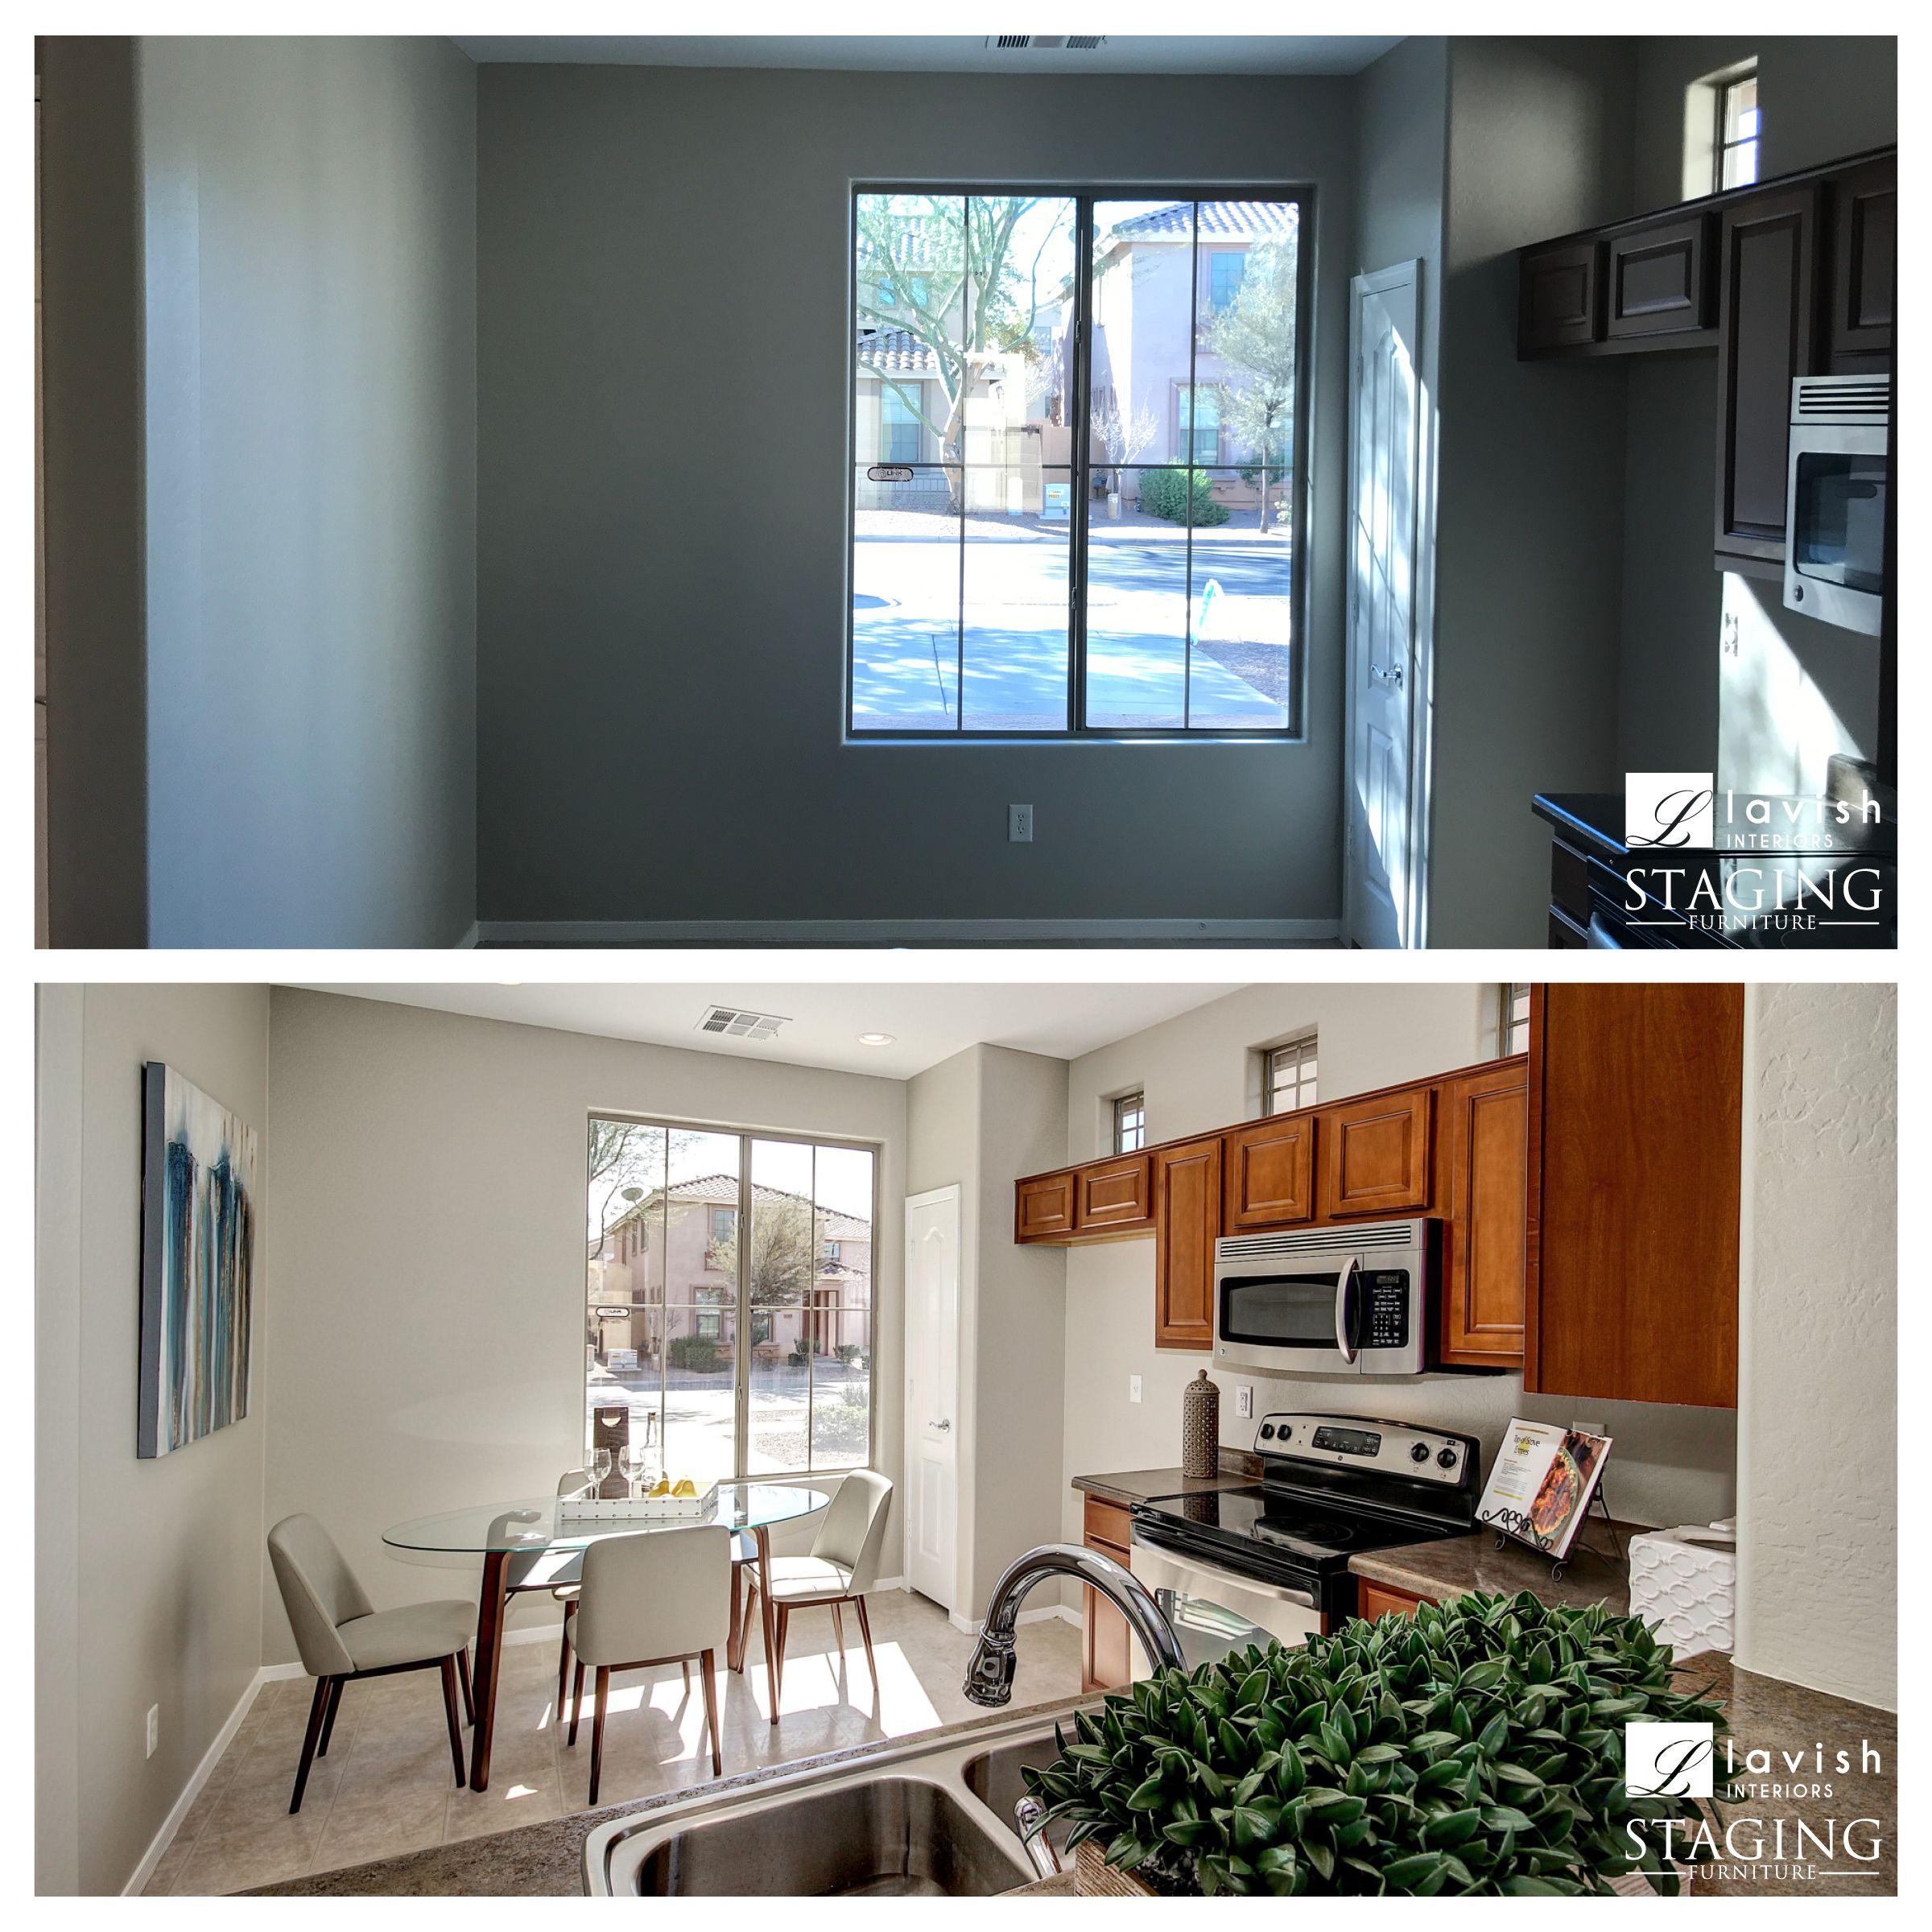 Interior Design Home Staging: Pin By Lavish Interiors On Lavish Interiors